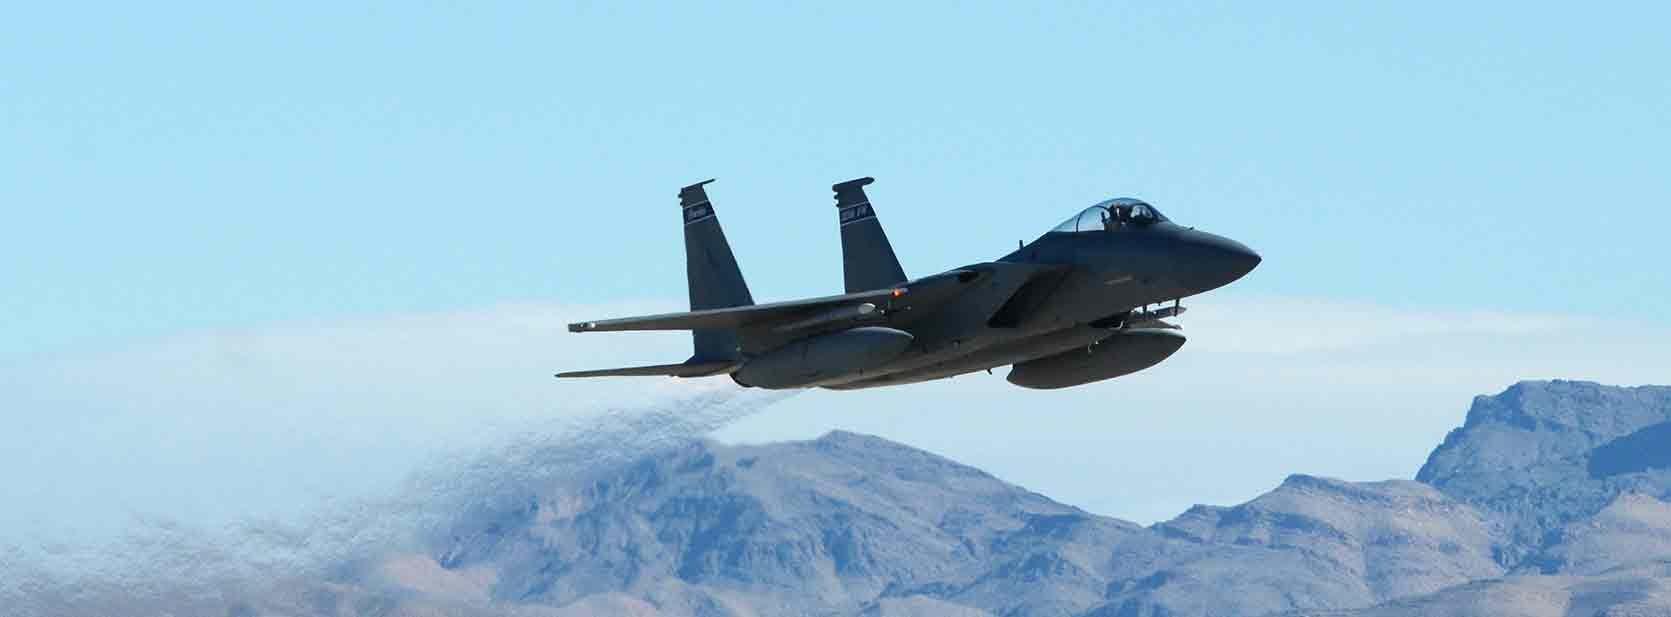 F-15-Eagle-Master-Sgt.-William-J.-Buchanan-Dept-of-Defense-lowres.jpg